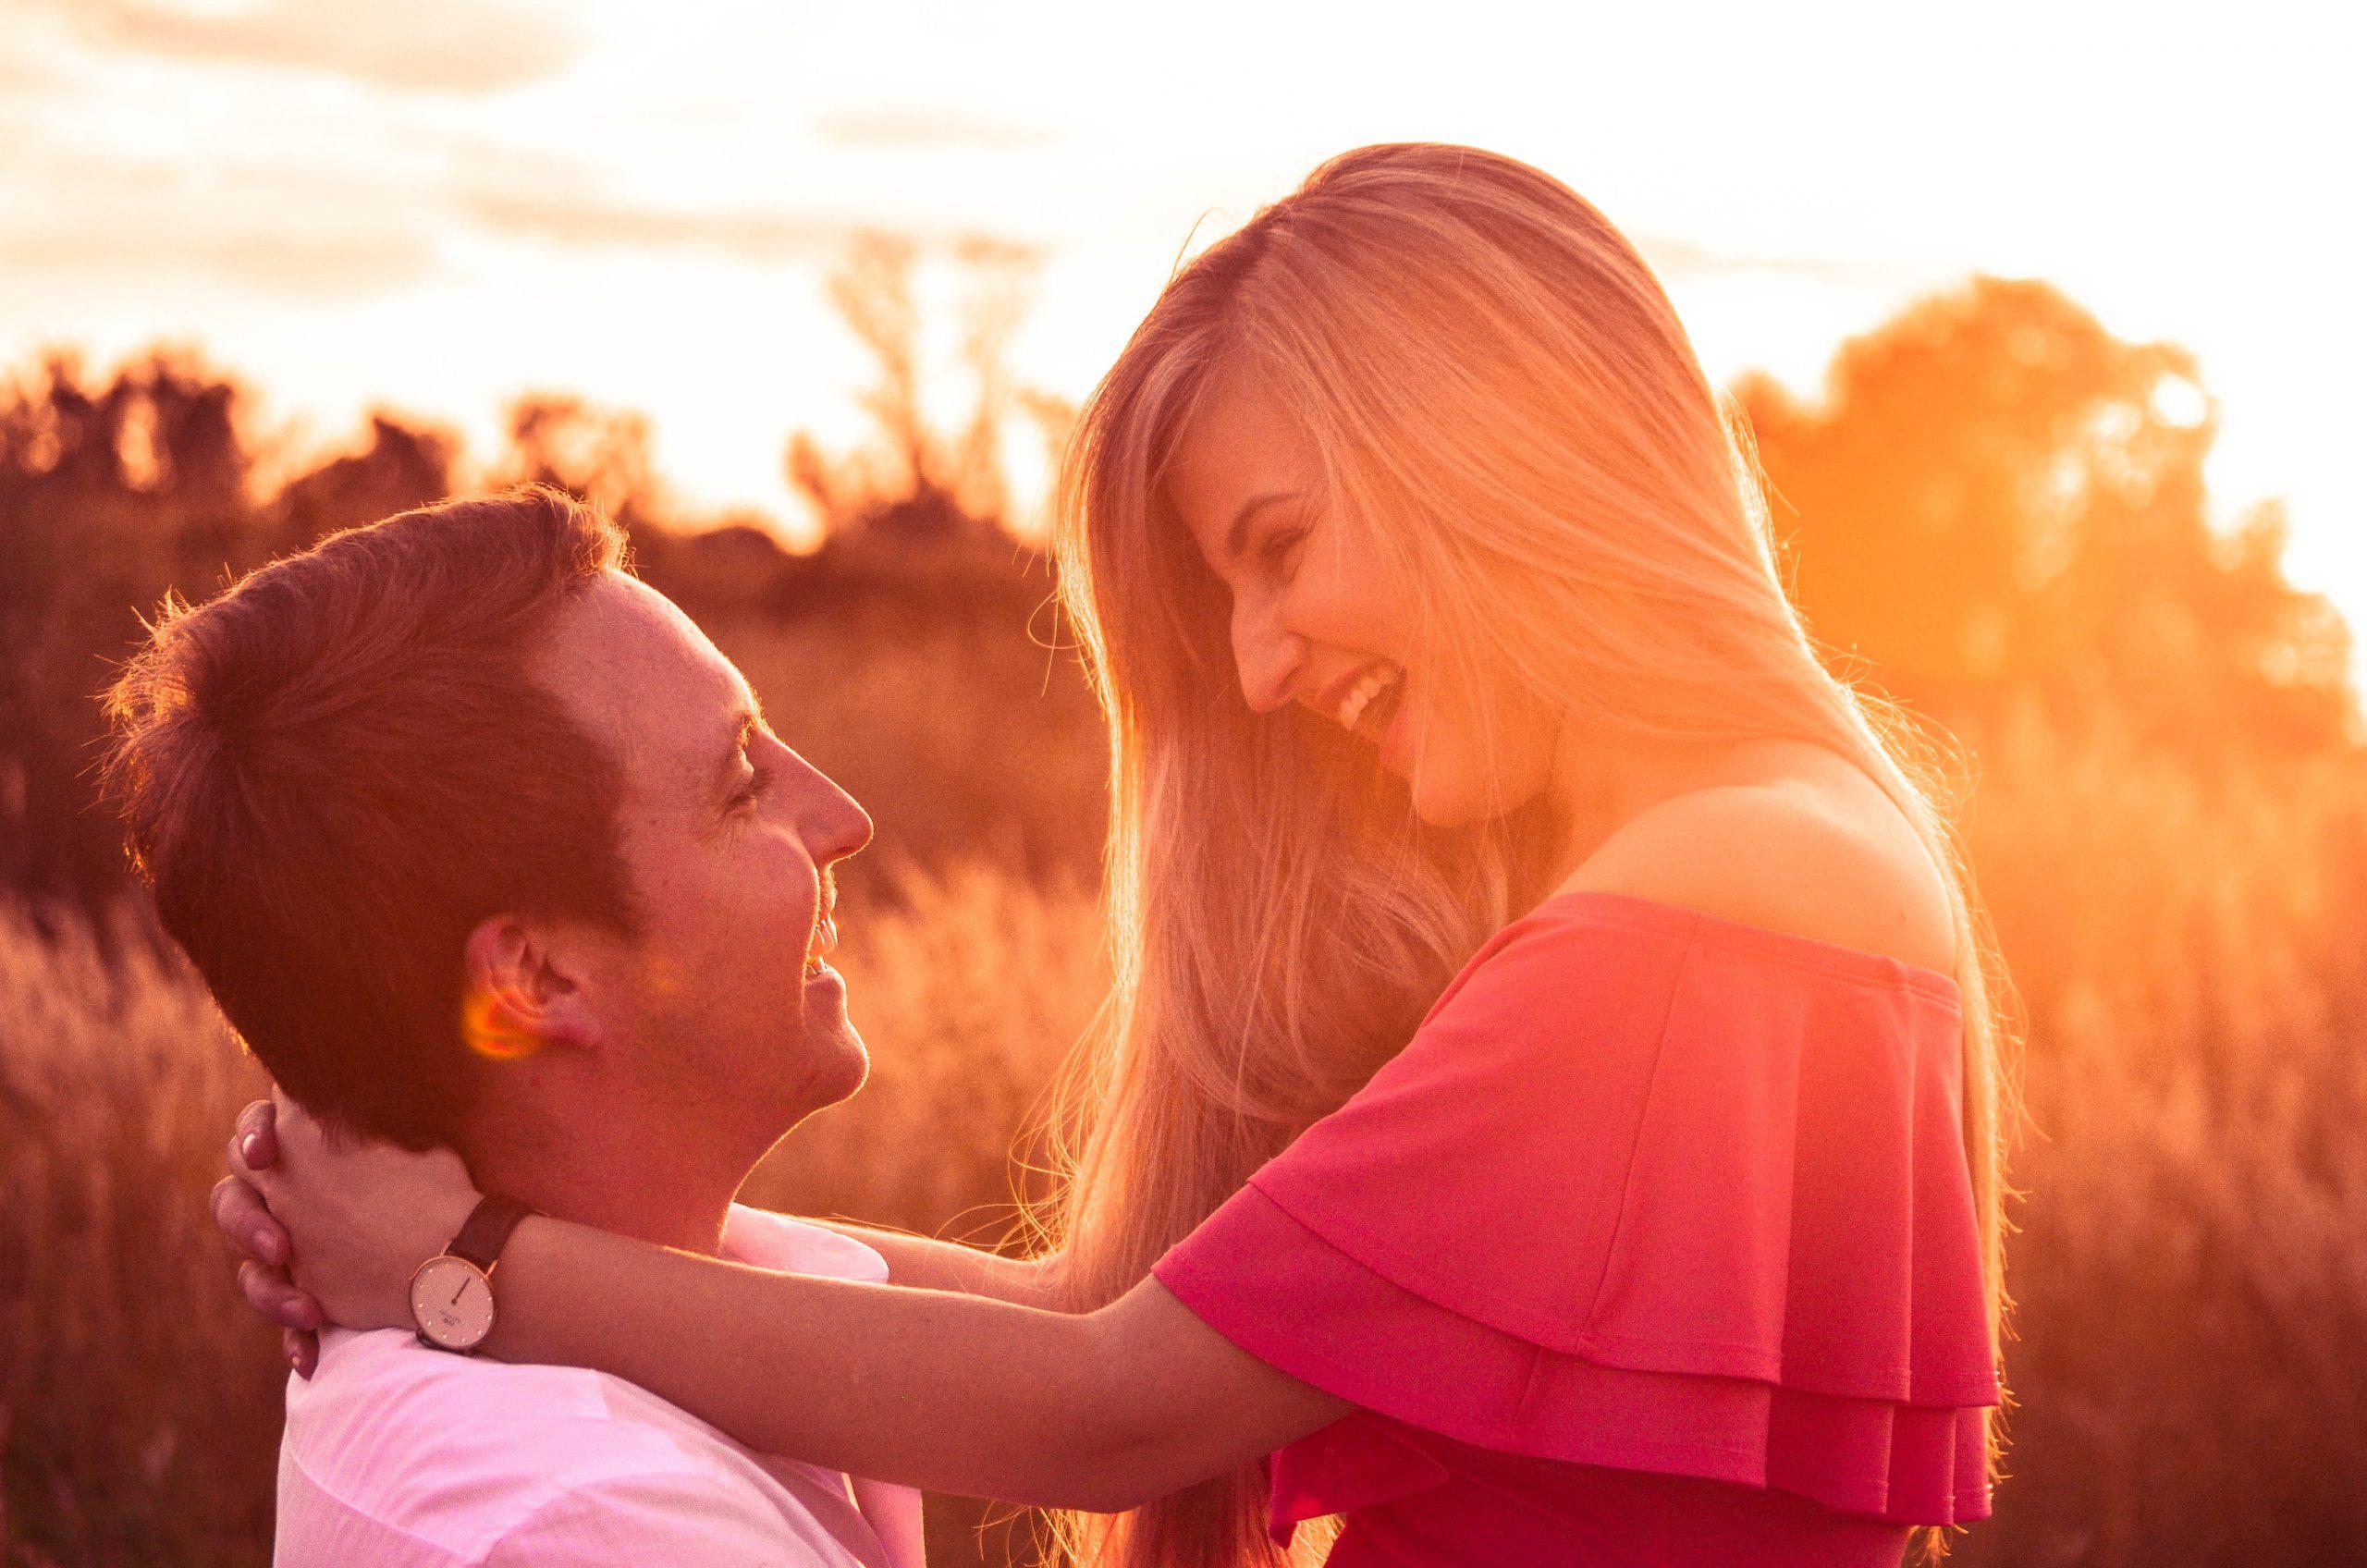 Meetic datingsite